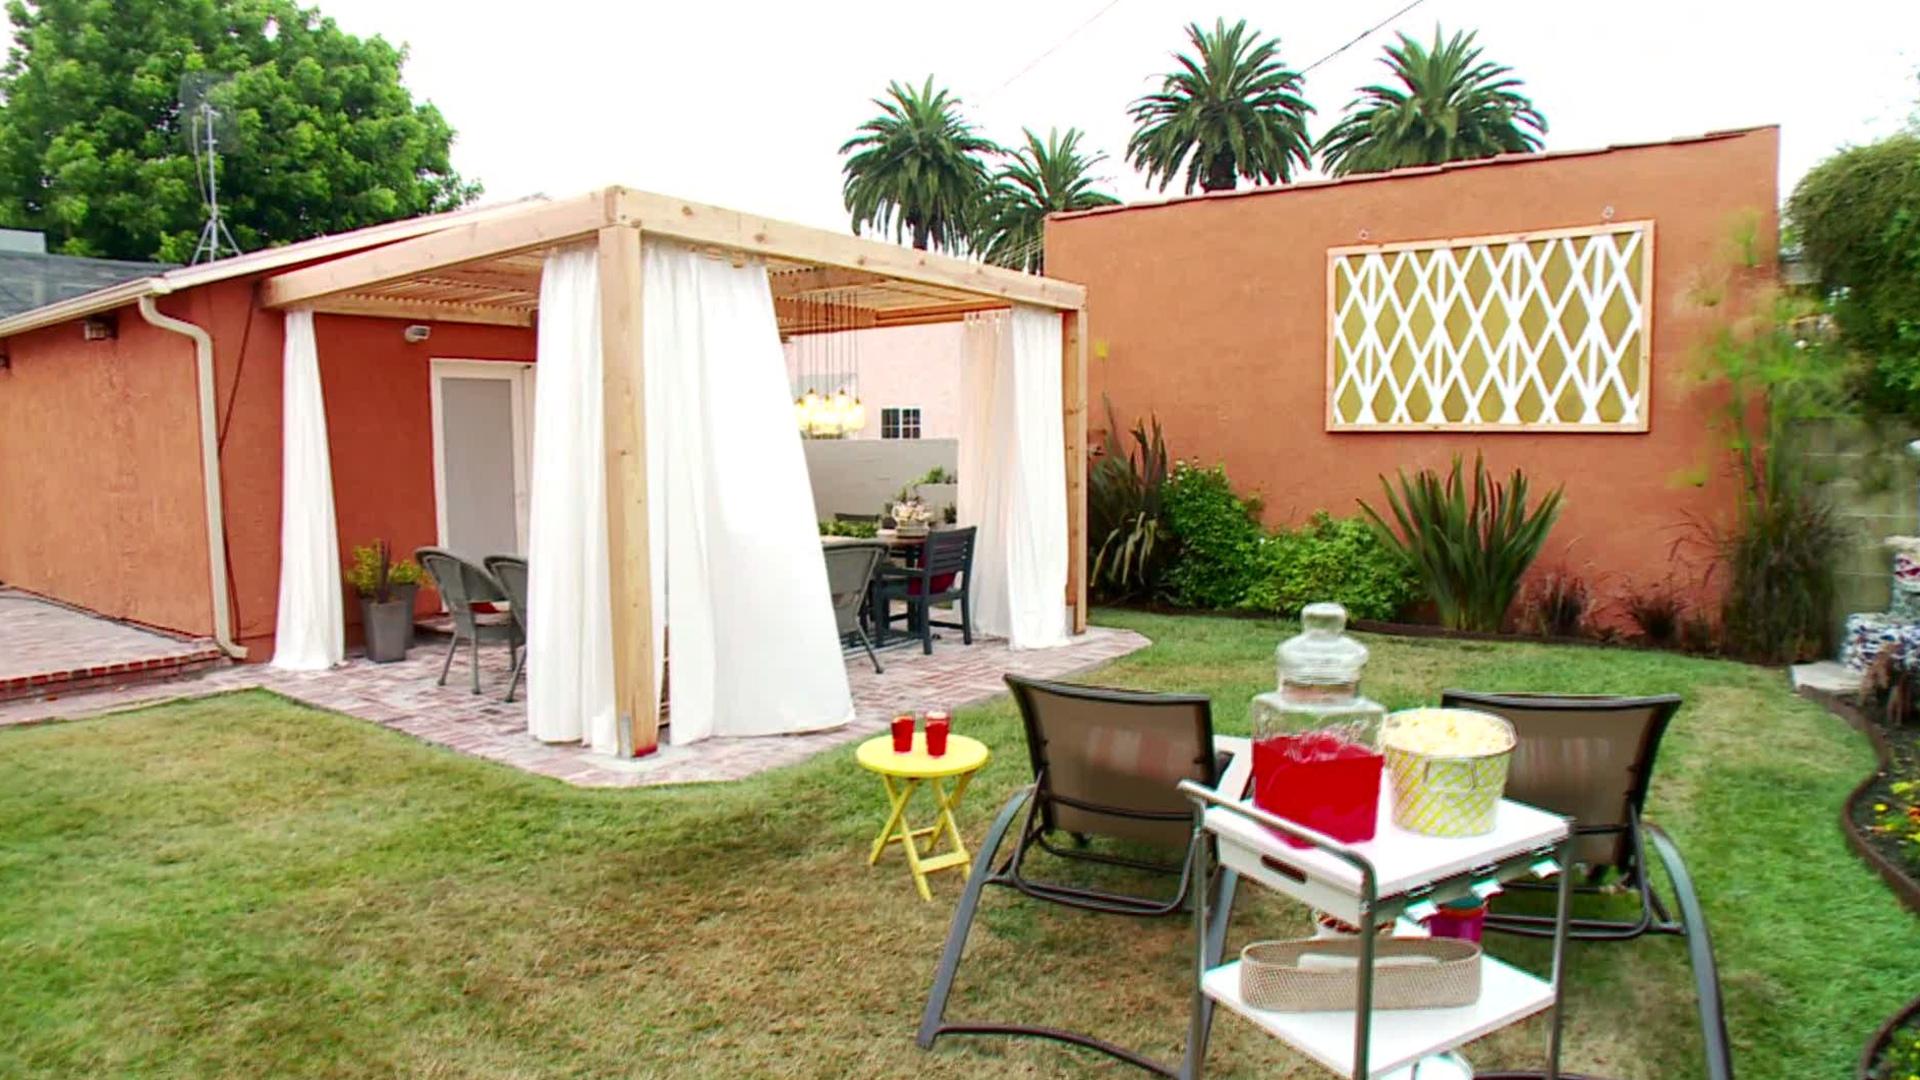 12 Budget-Friendly Backyards - Castel on Backyard Patio Designs On A Budget  id=87767